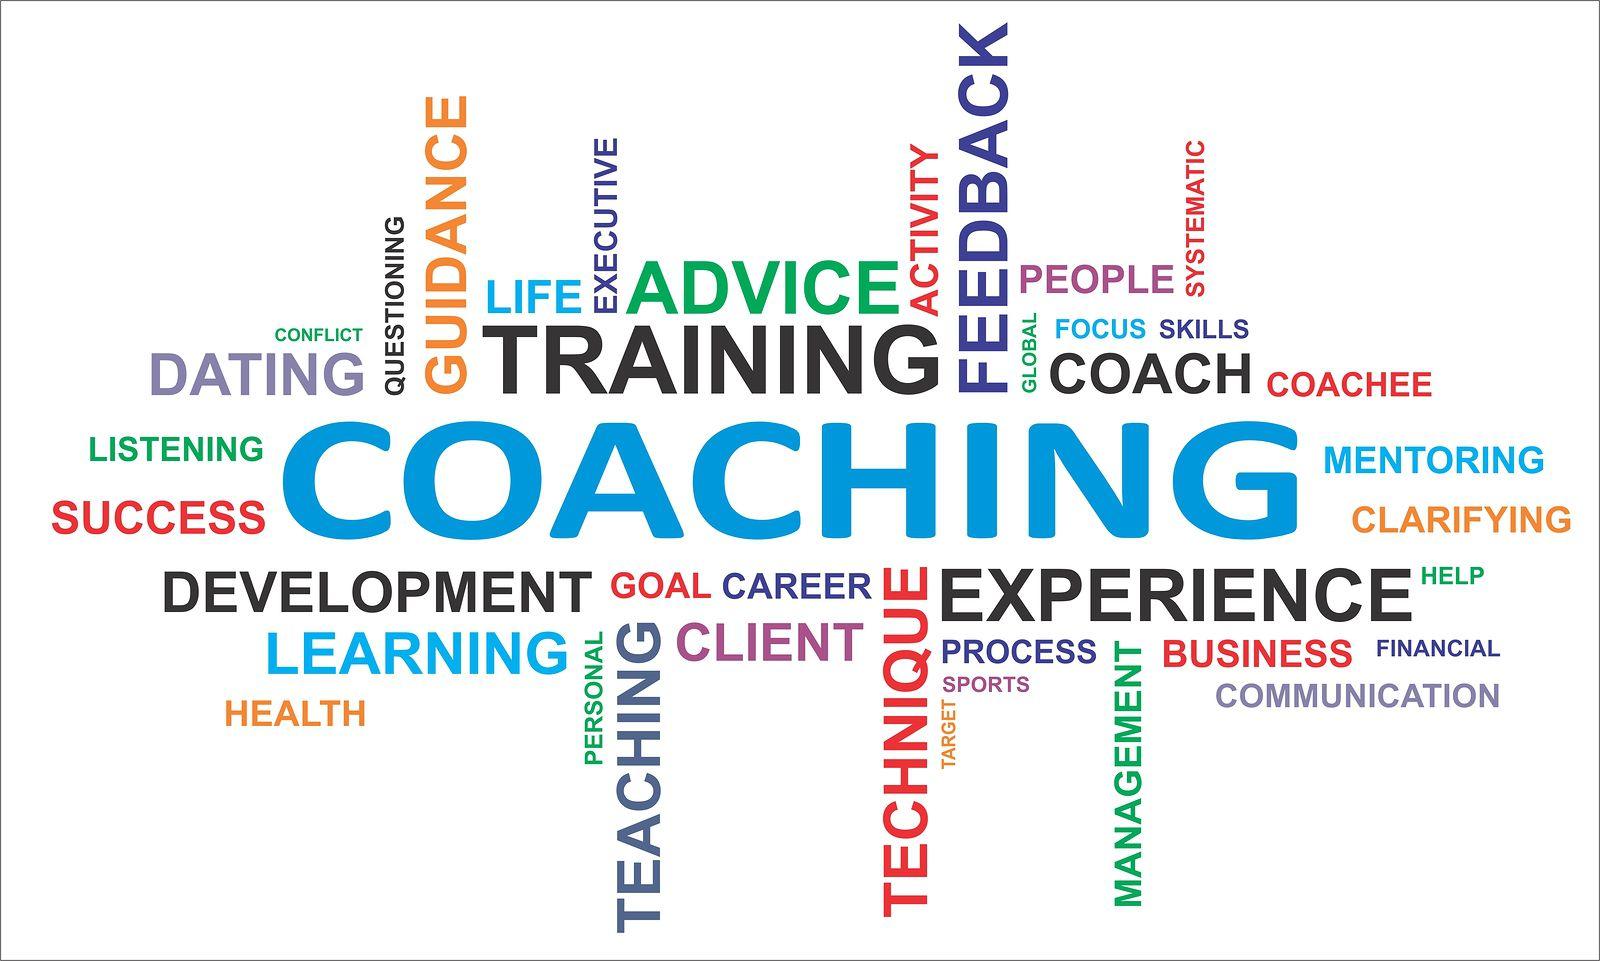 personal leadership development as a strategic Leadership development and strategic planning developing a strategic plan will help strategic planning and leadership development combine to create the.